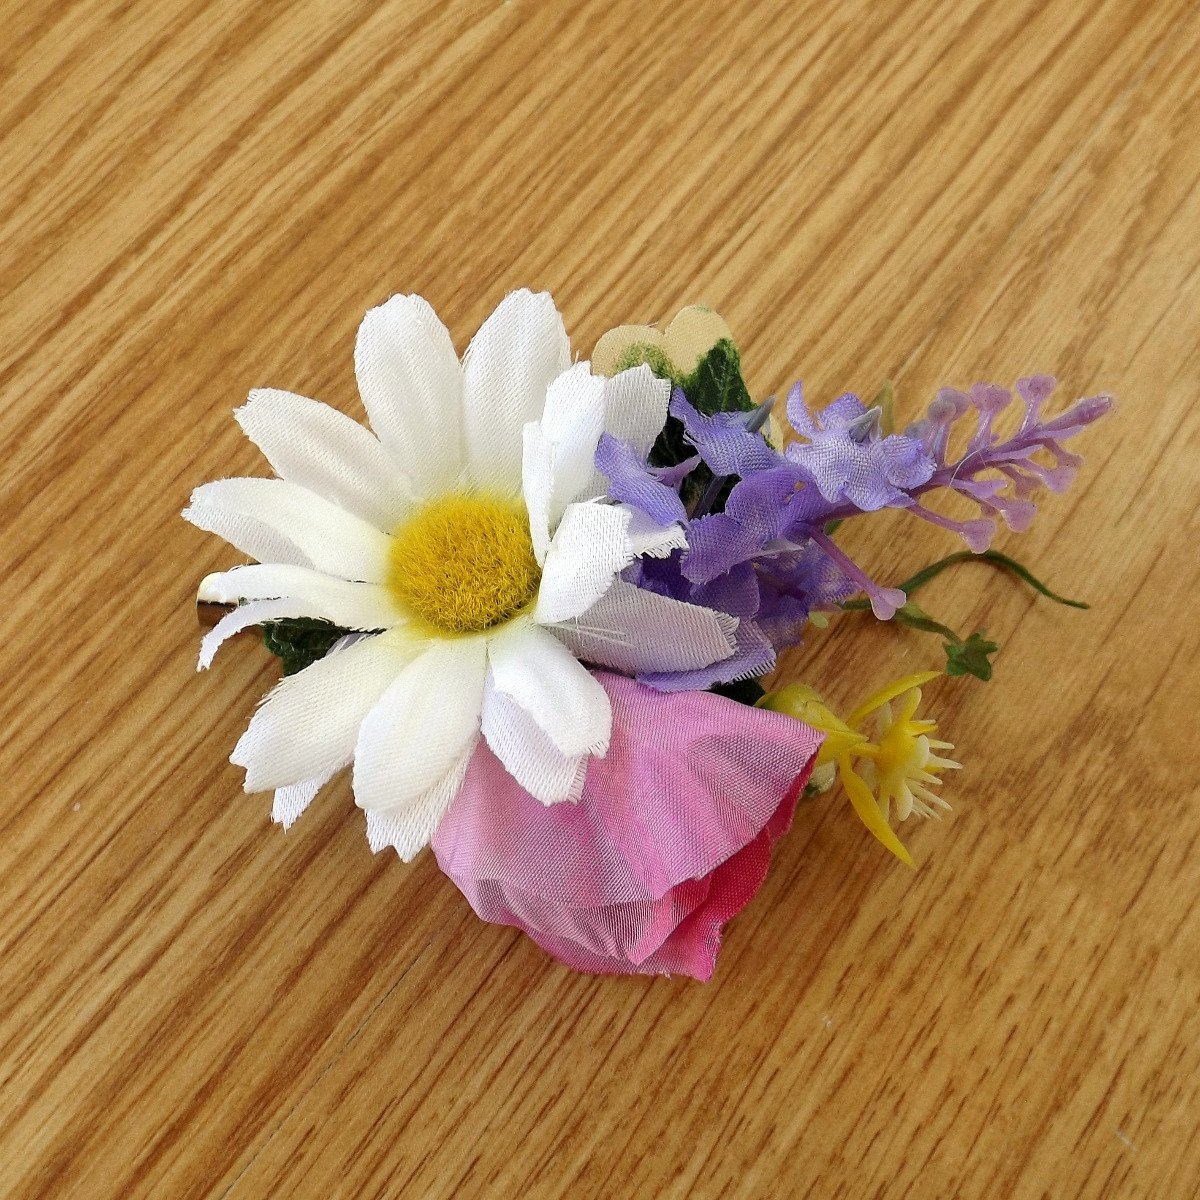 An artficial wedding flower hair clip